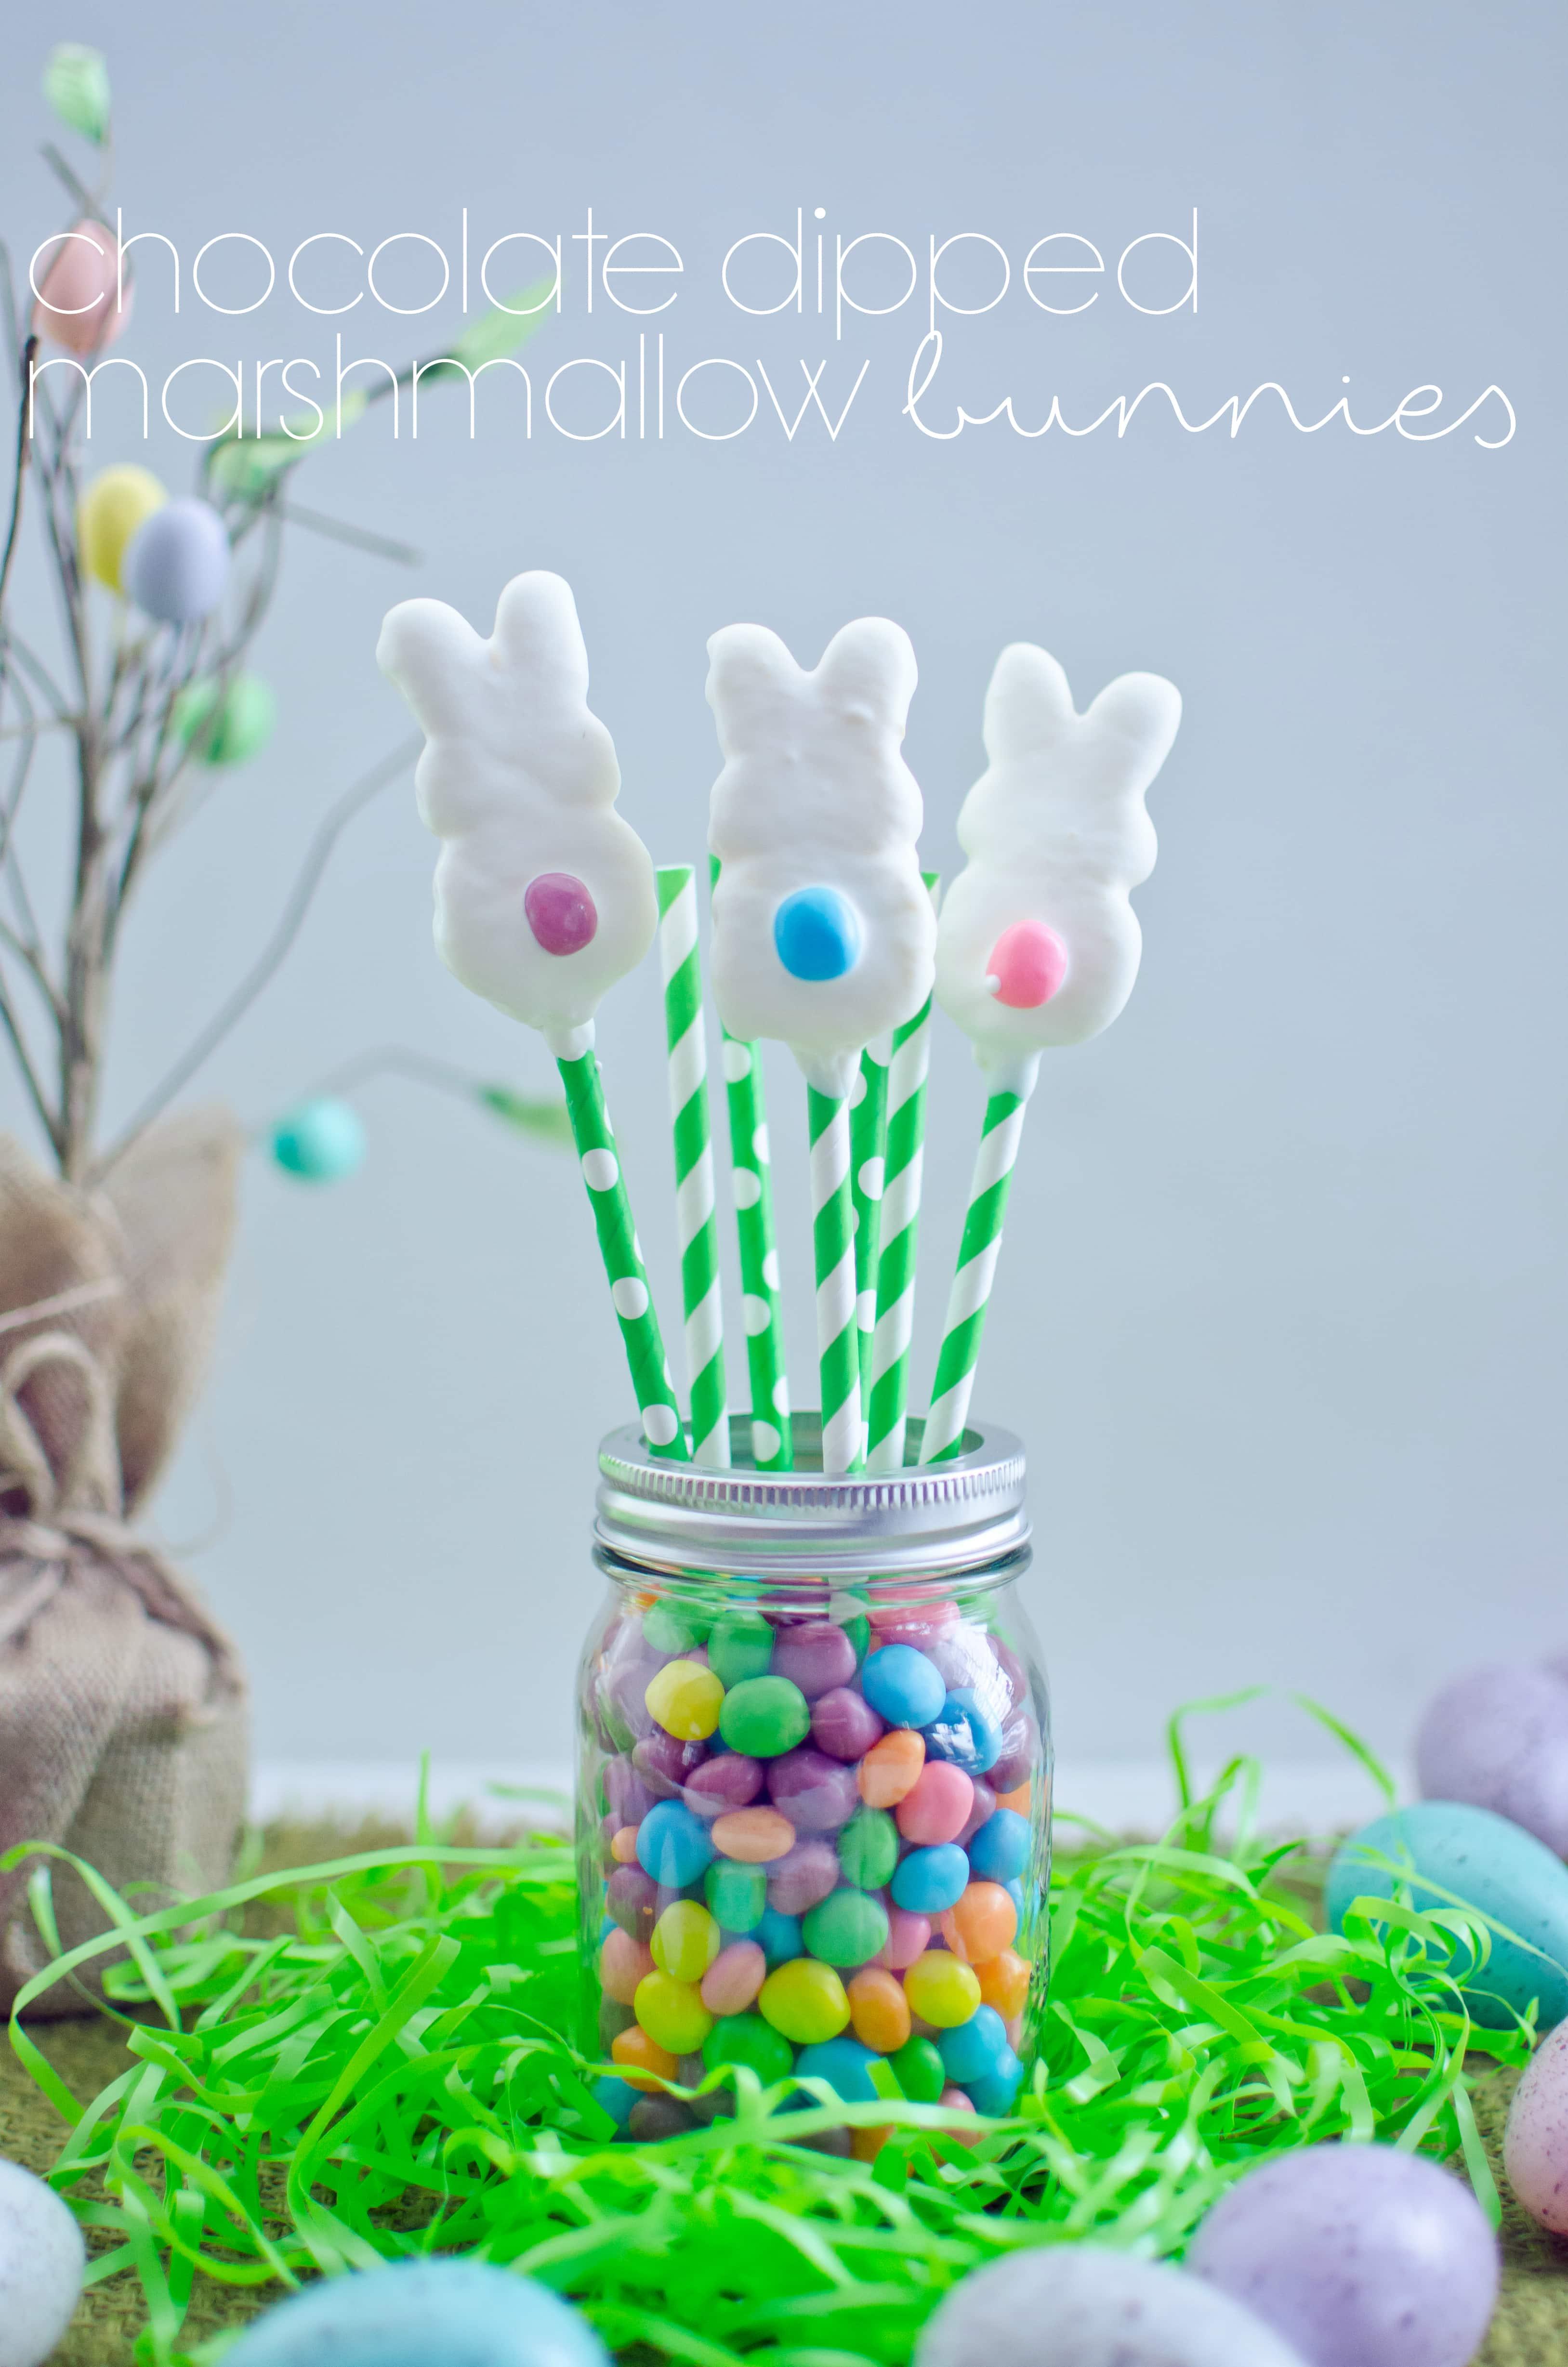 chocolate dipped marshmallow bunnies